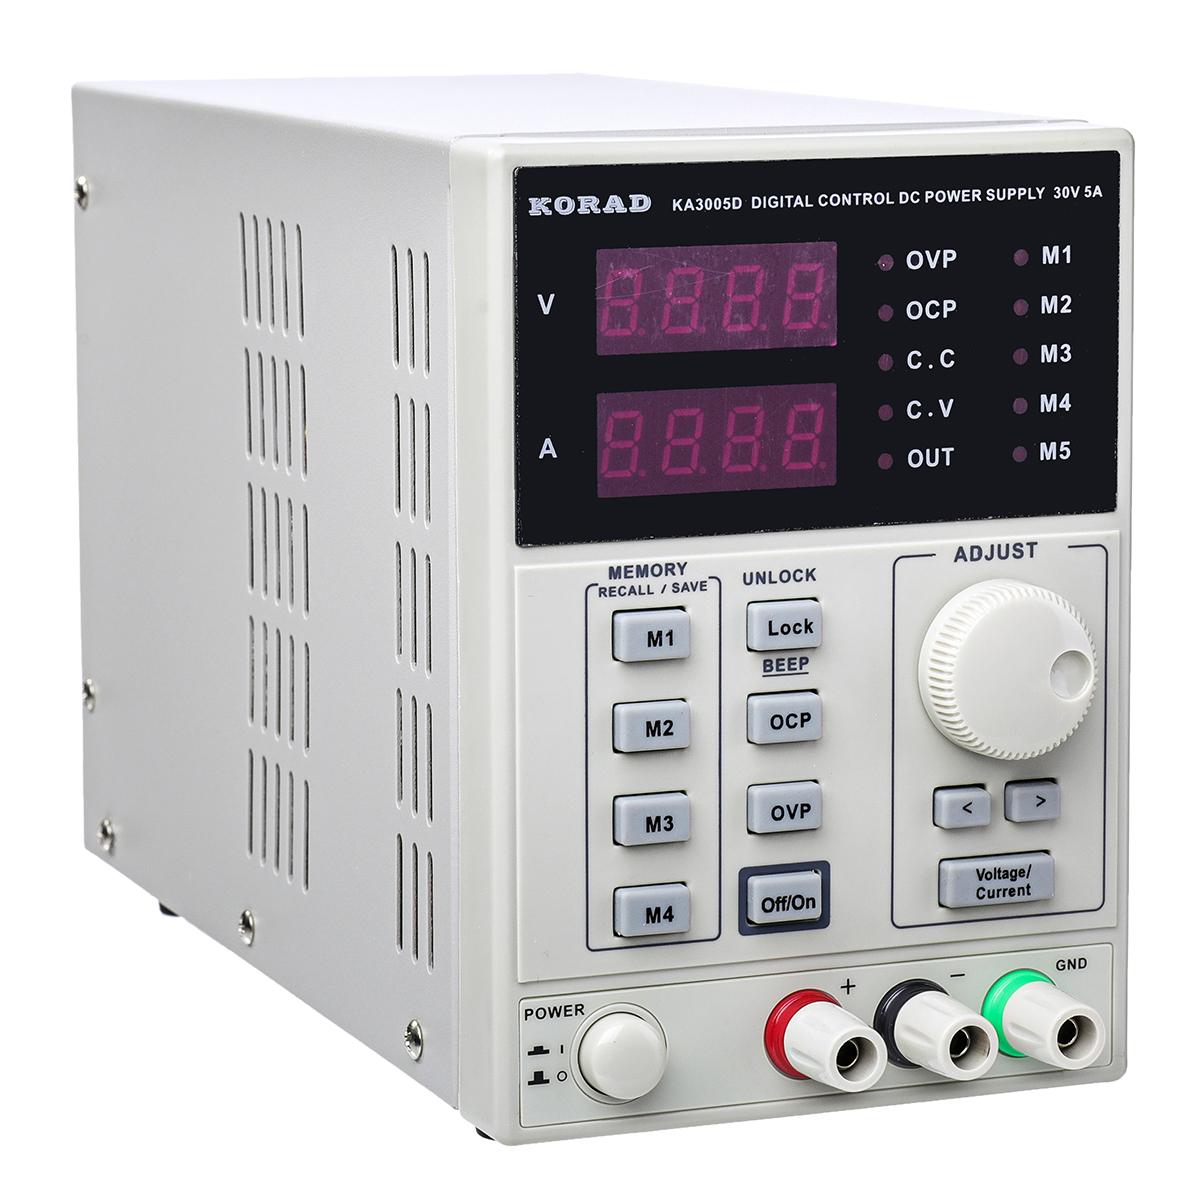 Laboratory-DC-Bench-Power-Supply-Variable-Benchtop-0-30V-0-5A-LCD-Display thumbnail 2